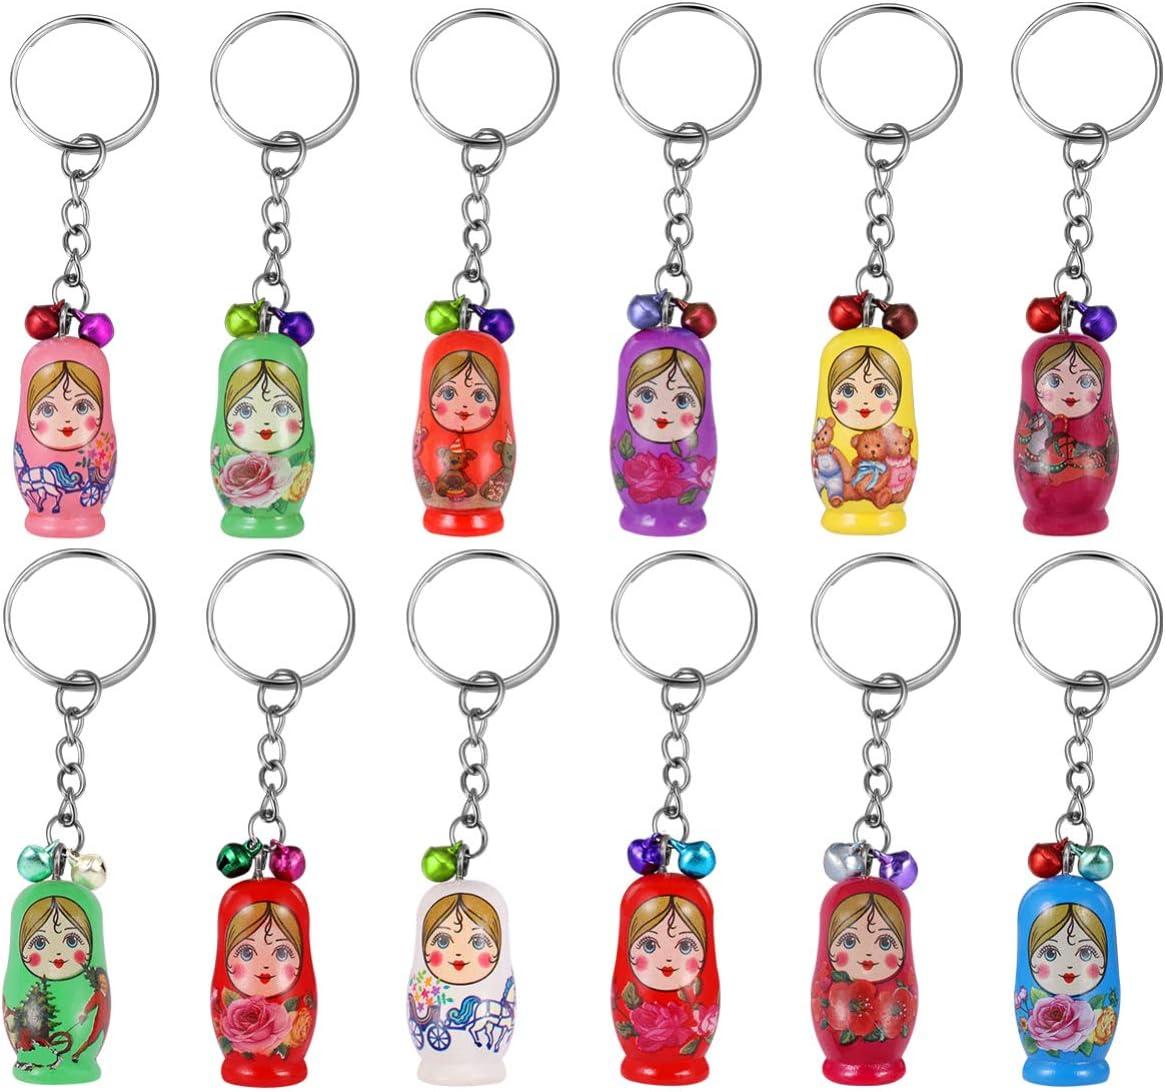 STOBOK Wooden Matryoshka Bombing free shipping Russian Dolls Keychains Max 64% OFF for Rings Key G